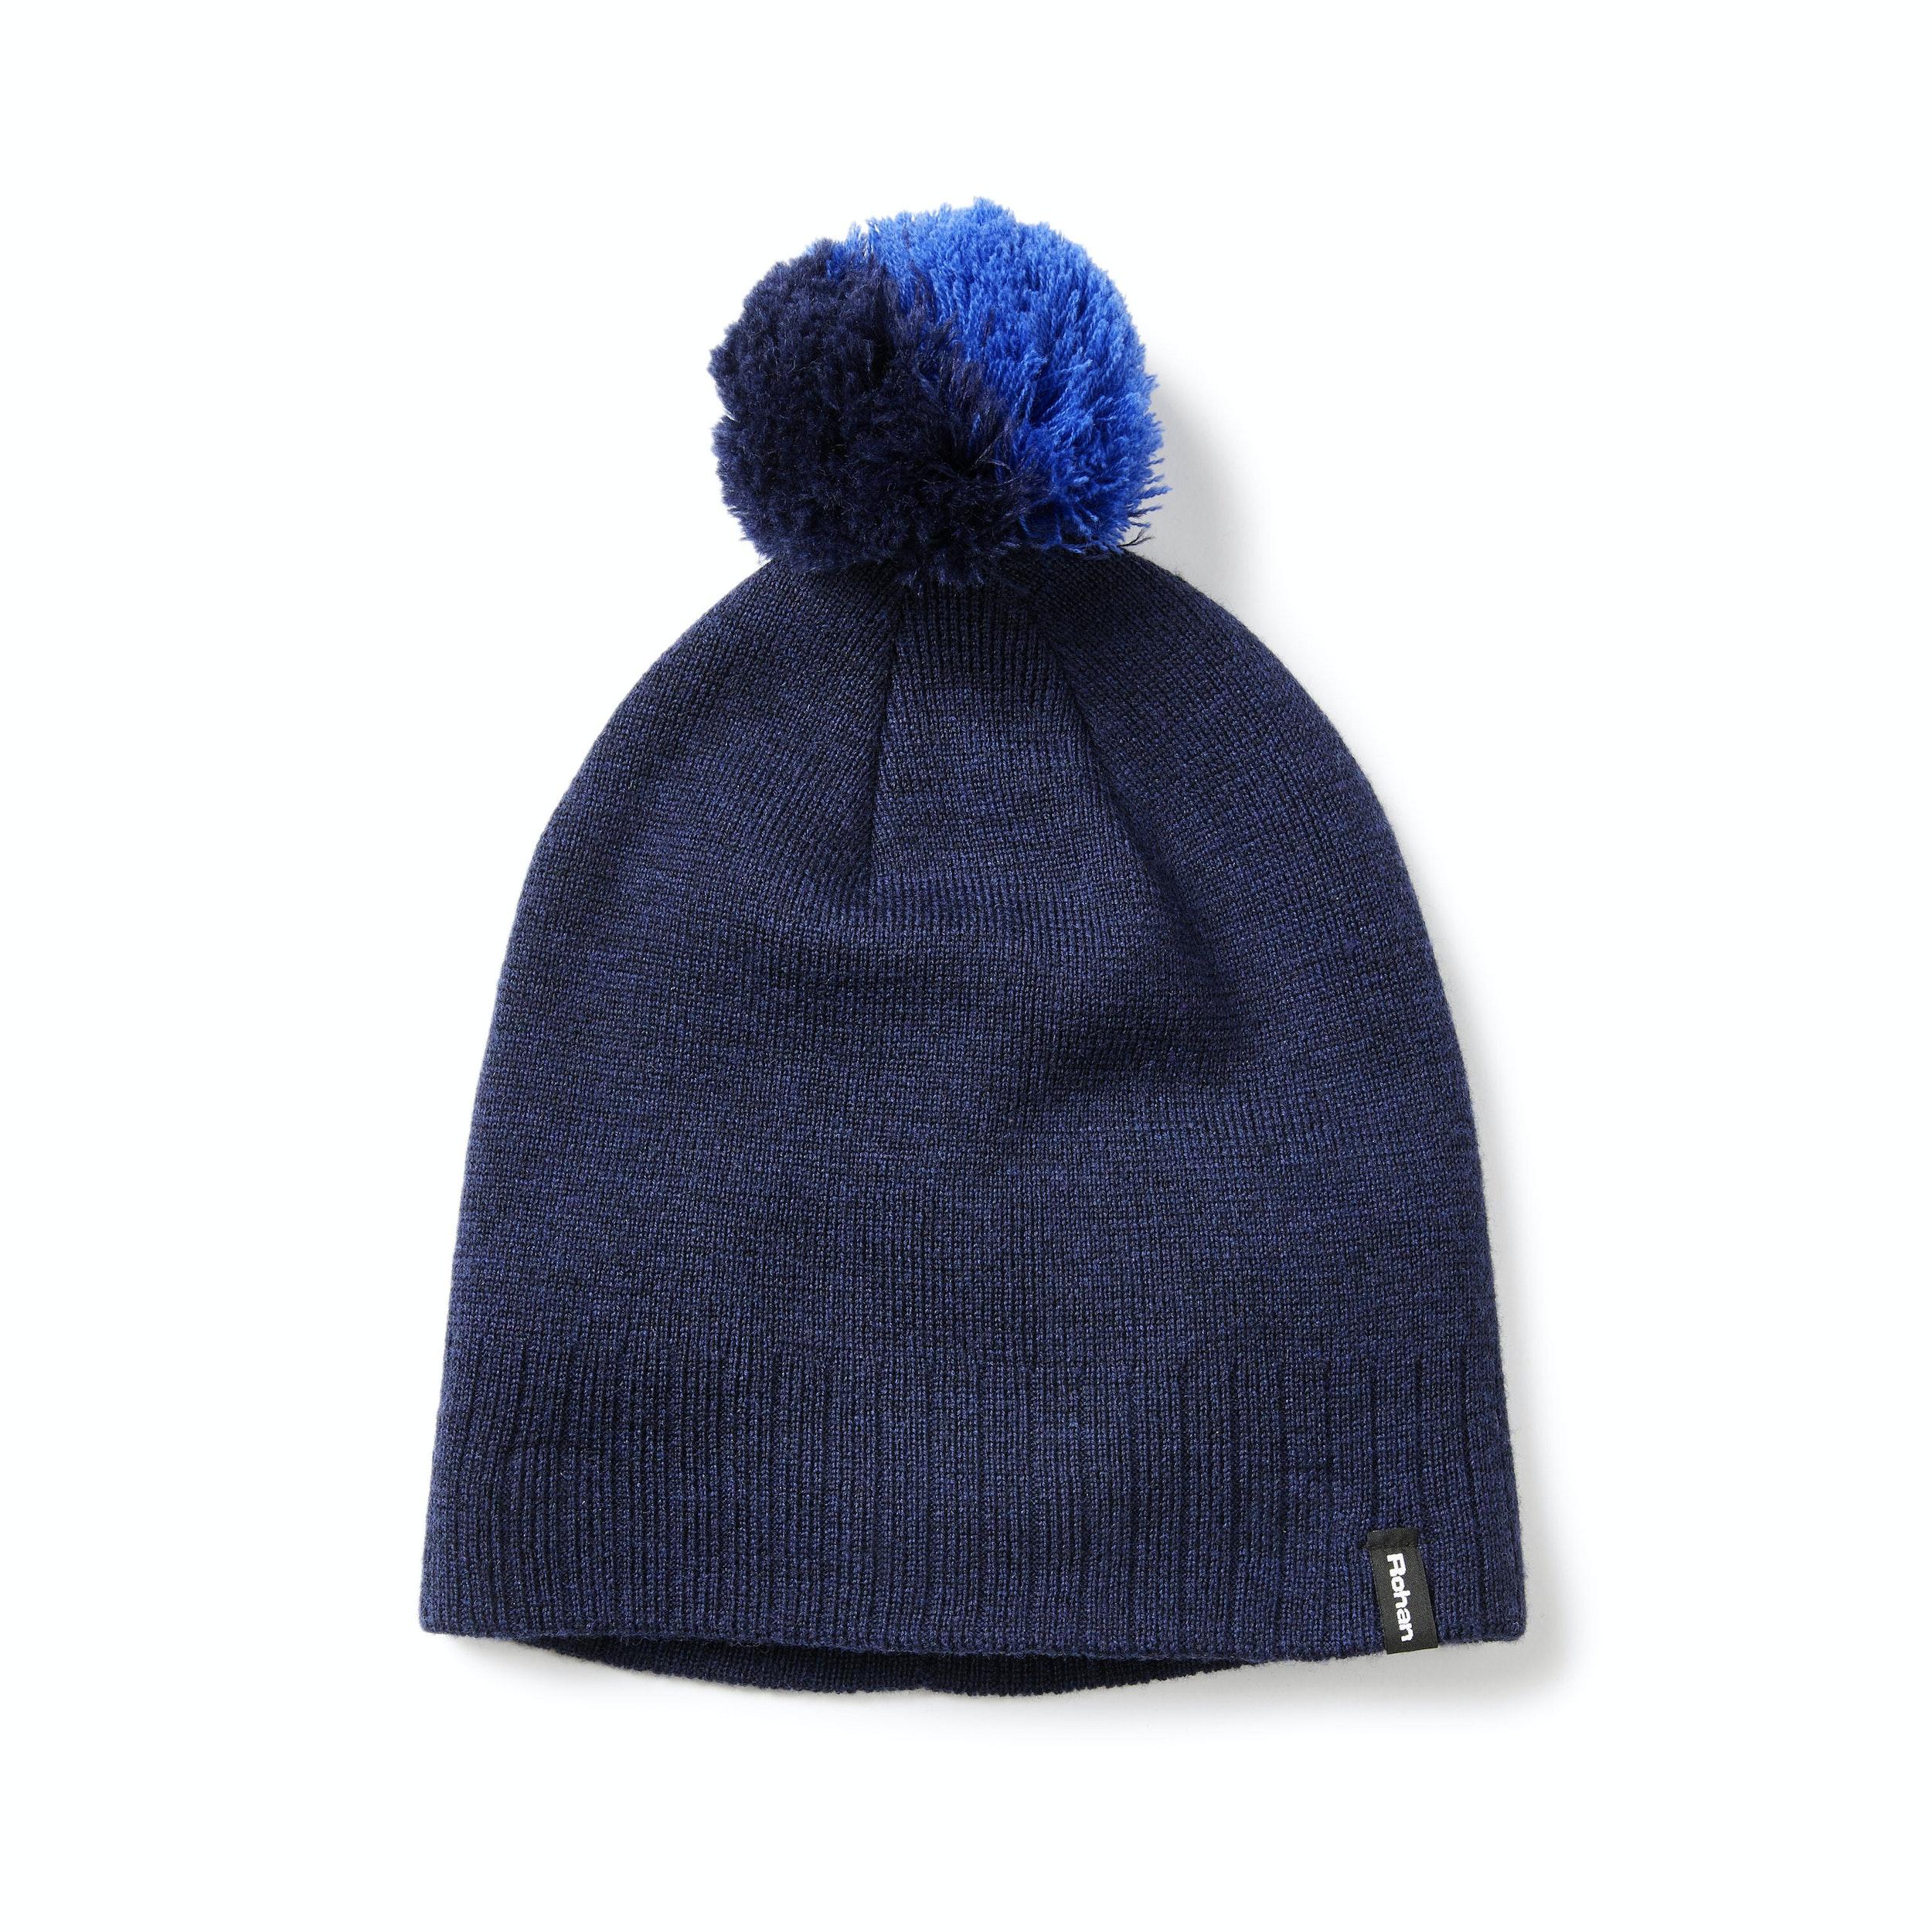 e5a4675cdc5 Women s Extrafine Merino Hat - Luxury merino bobble hat.